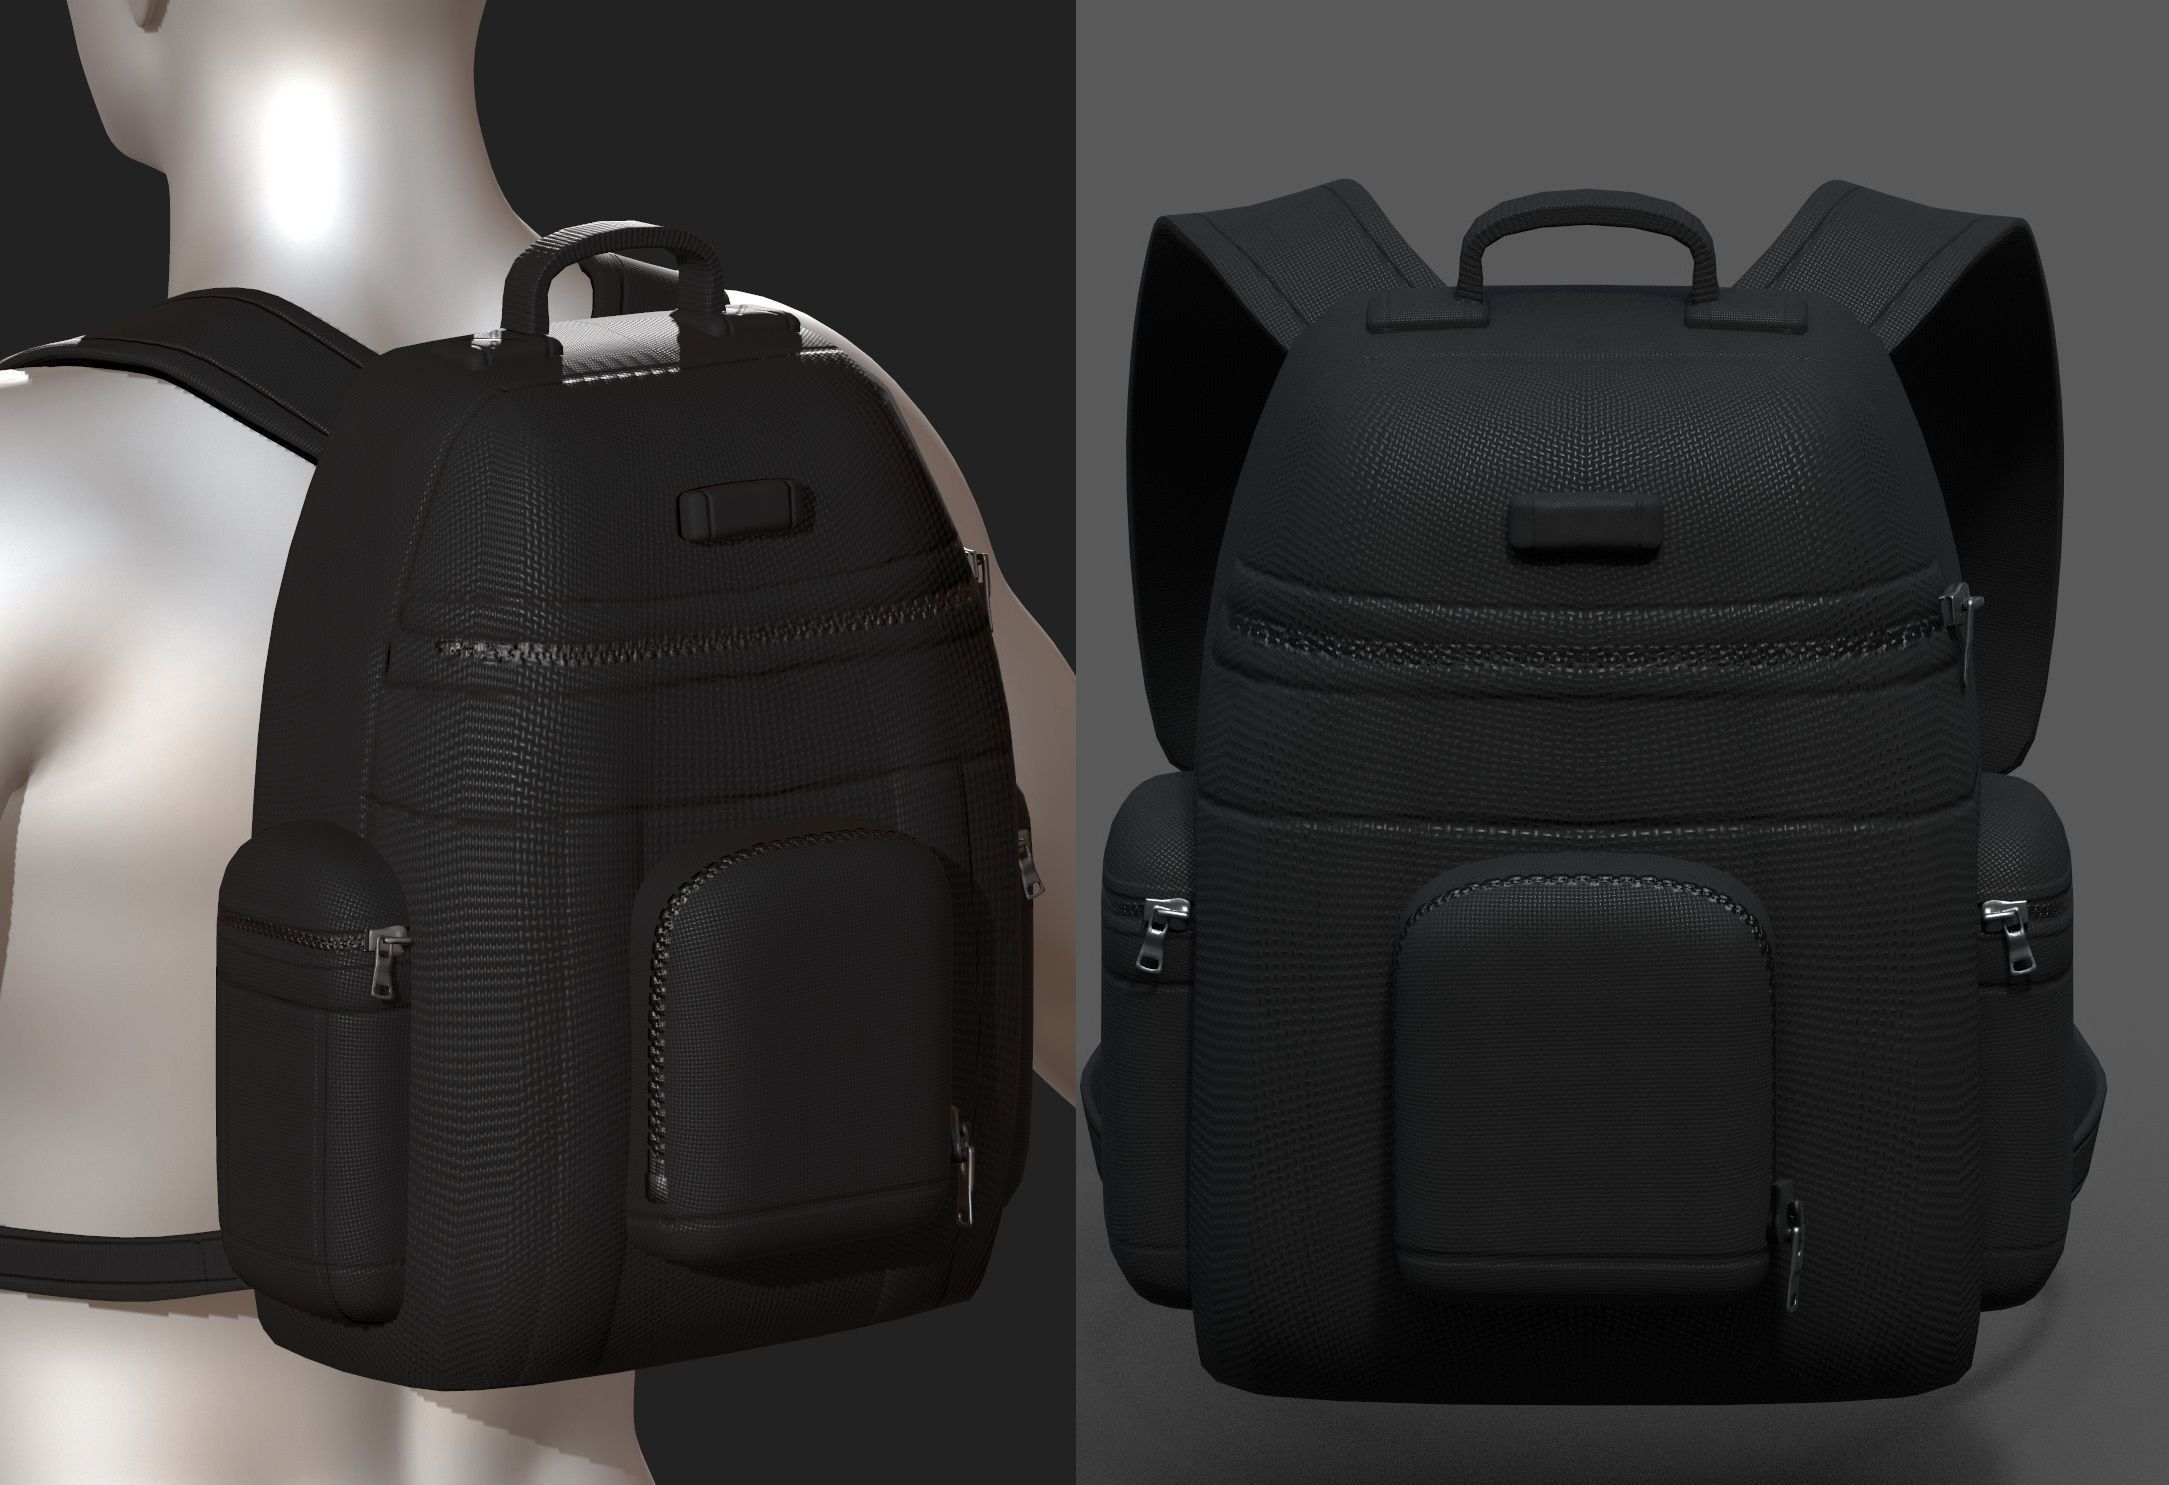 Backpack Camping Generic military combat